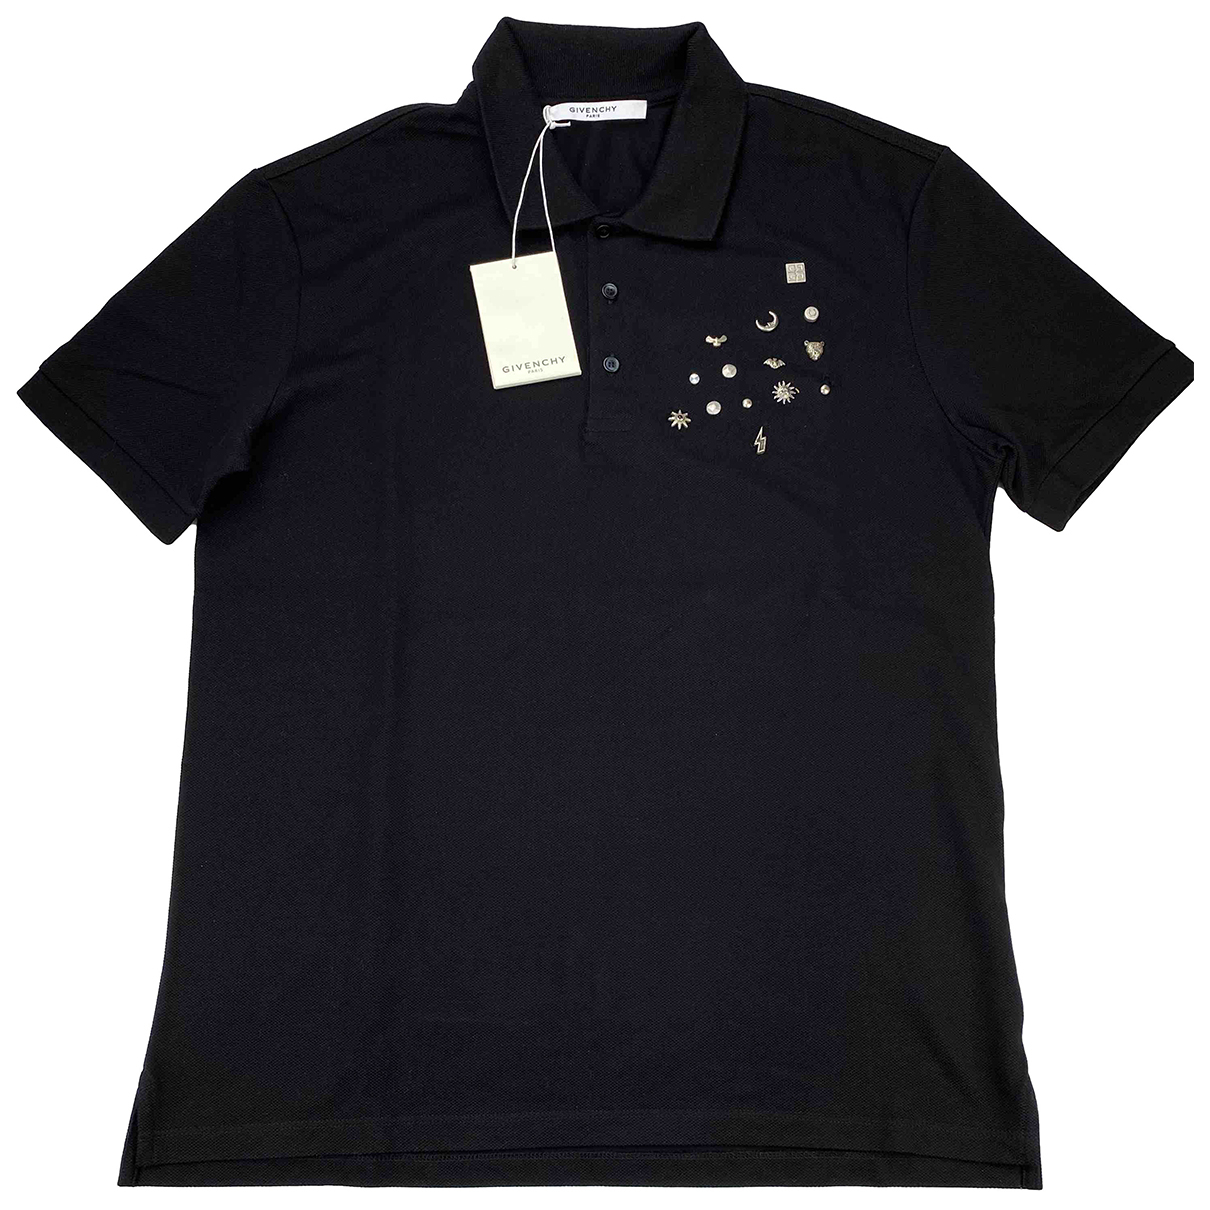 Givenchy \N T-Shirts in  Schwarz Baumwolle